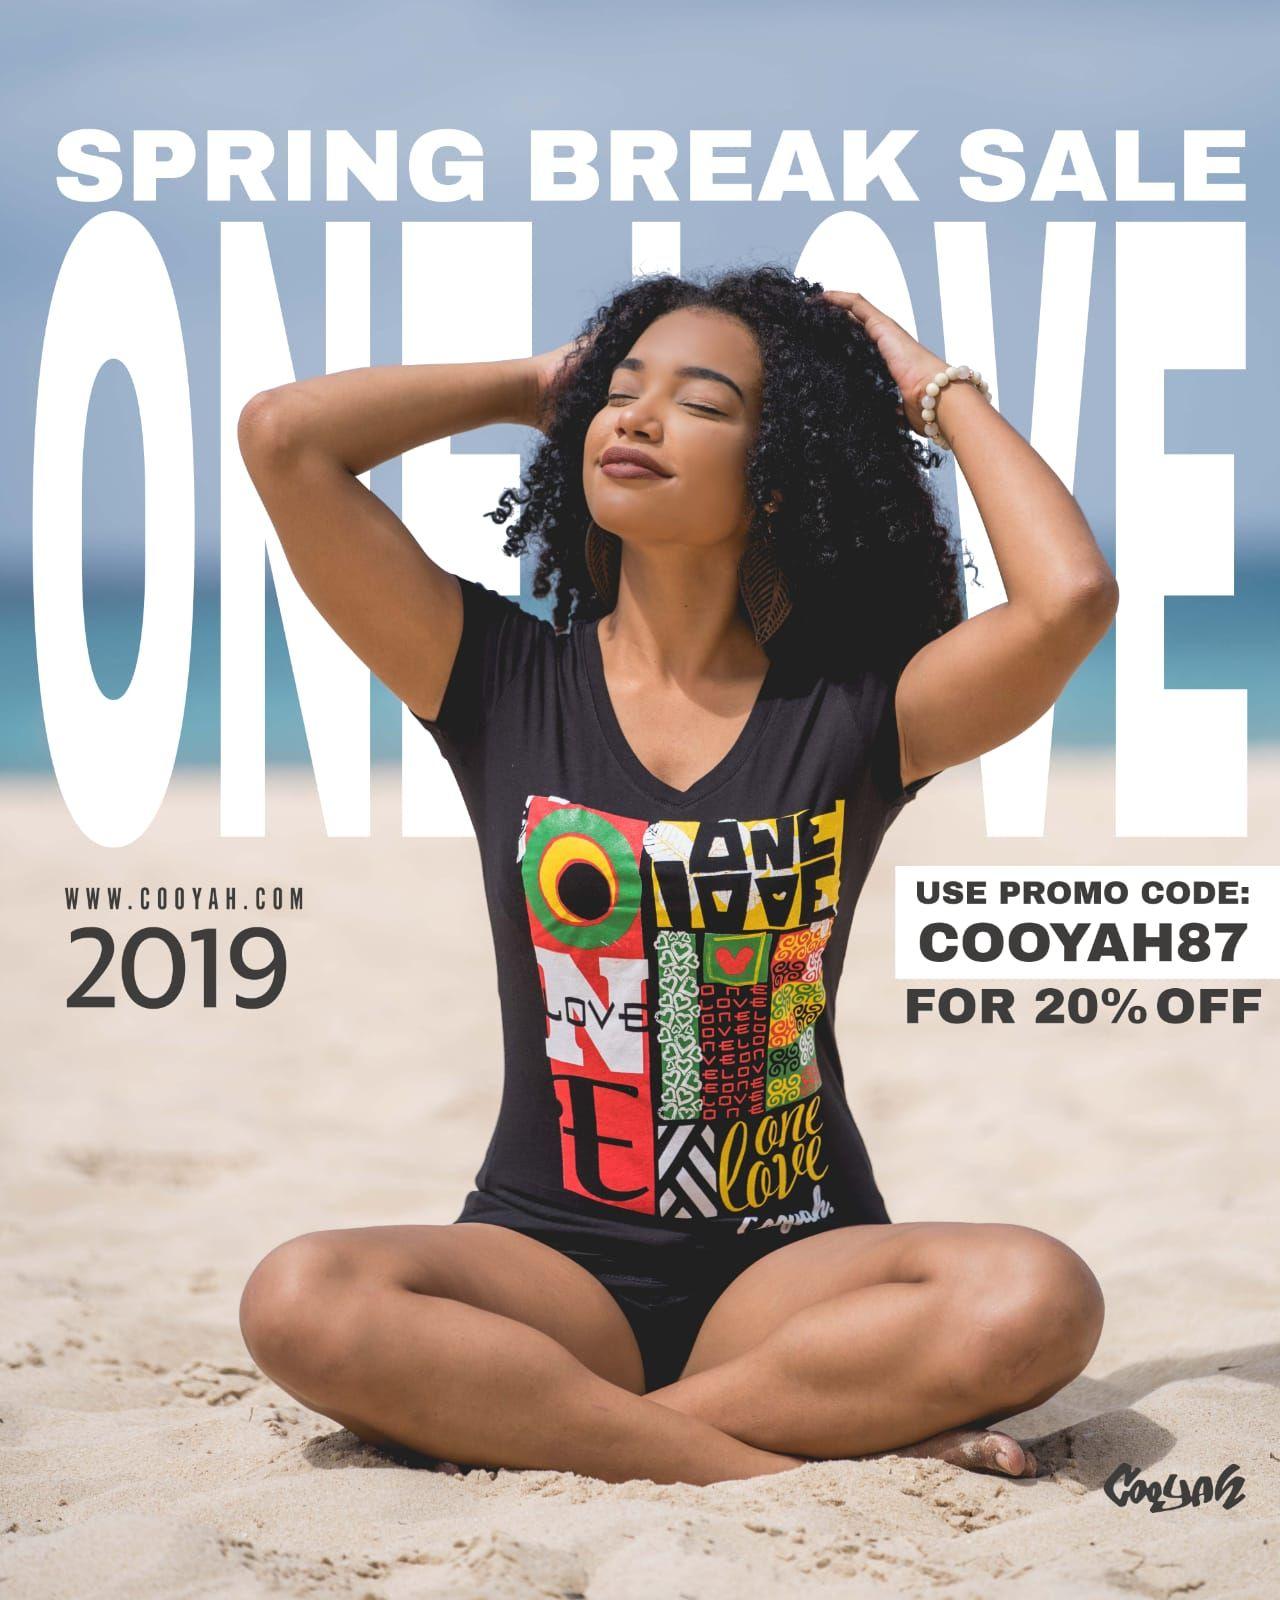 Cooyah Spring Break Sale Use Promo Code Cooyah87 For 20